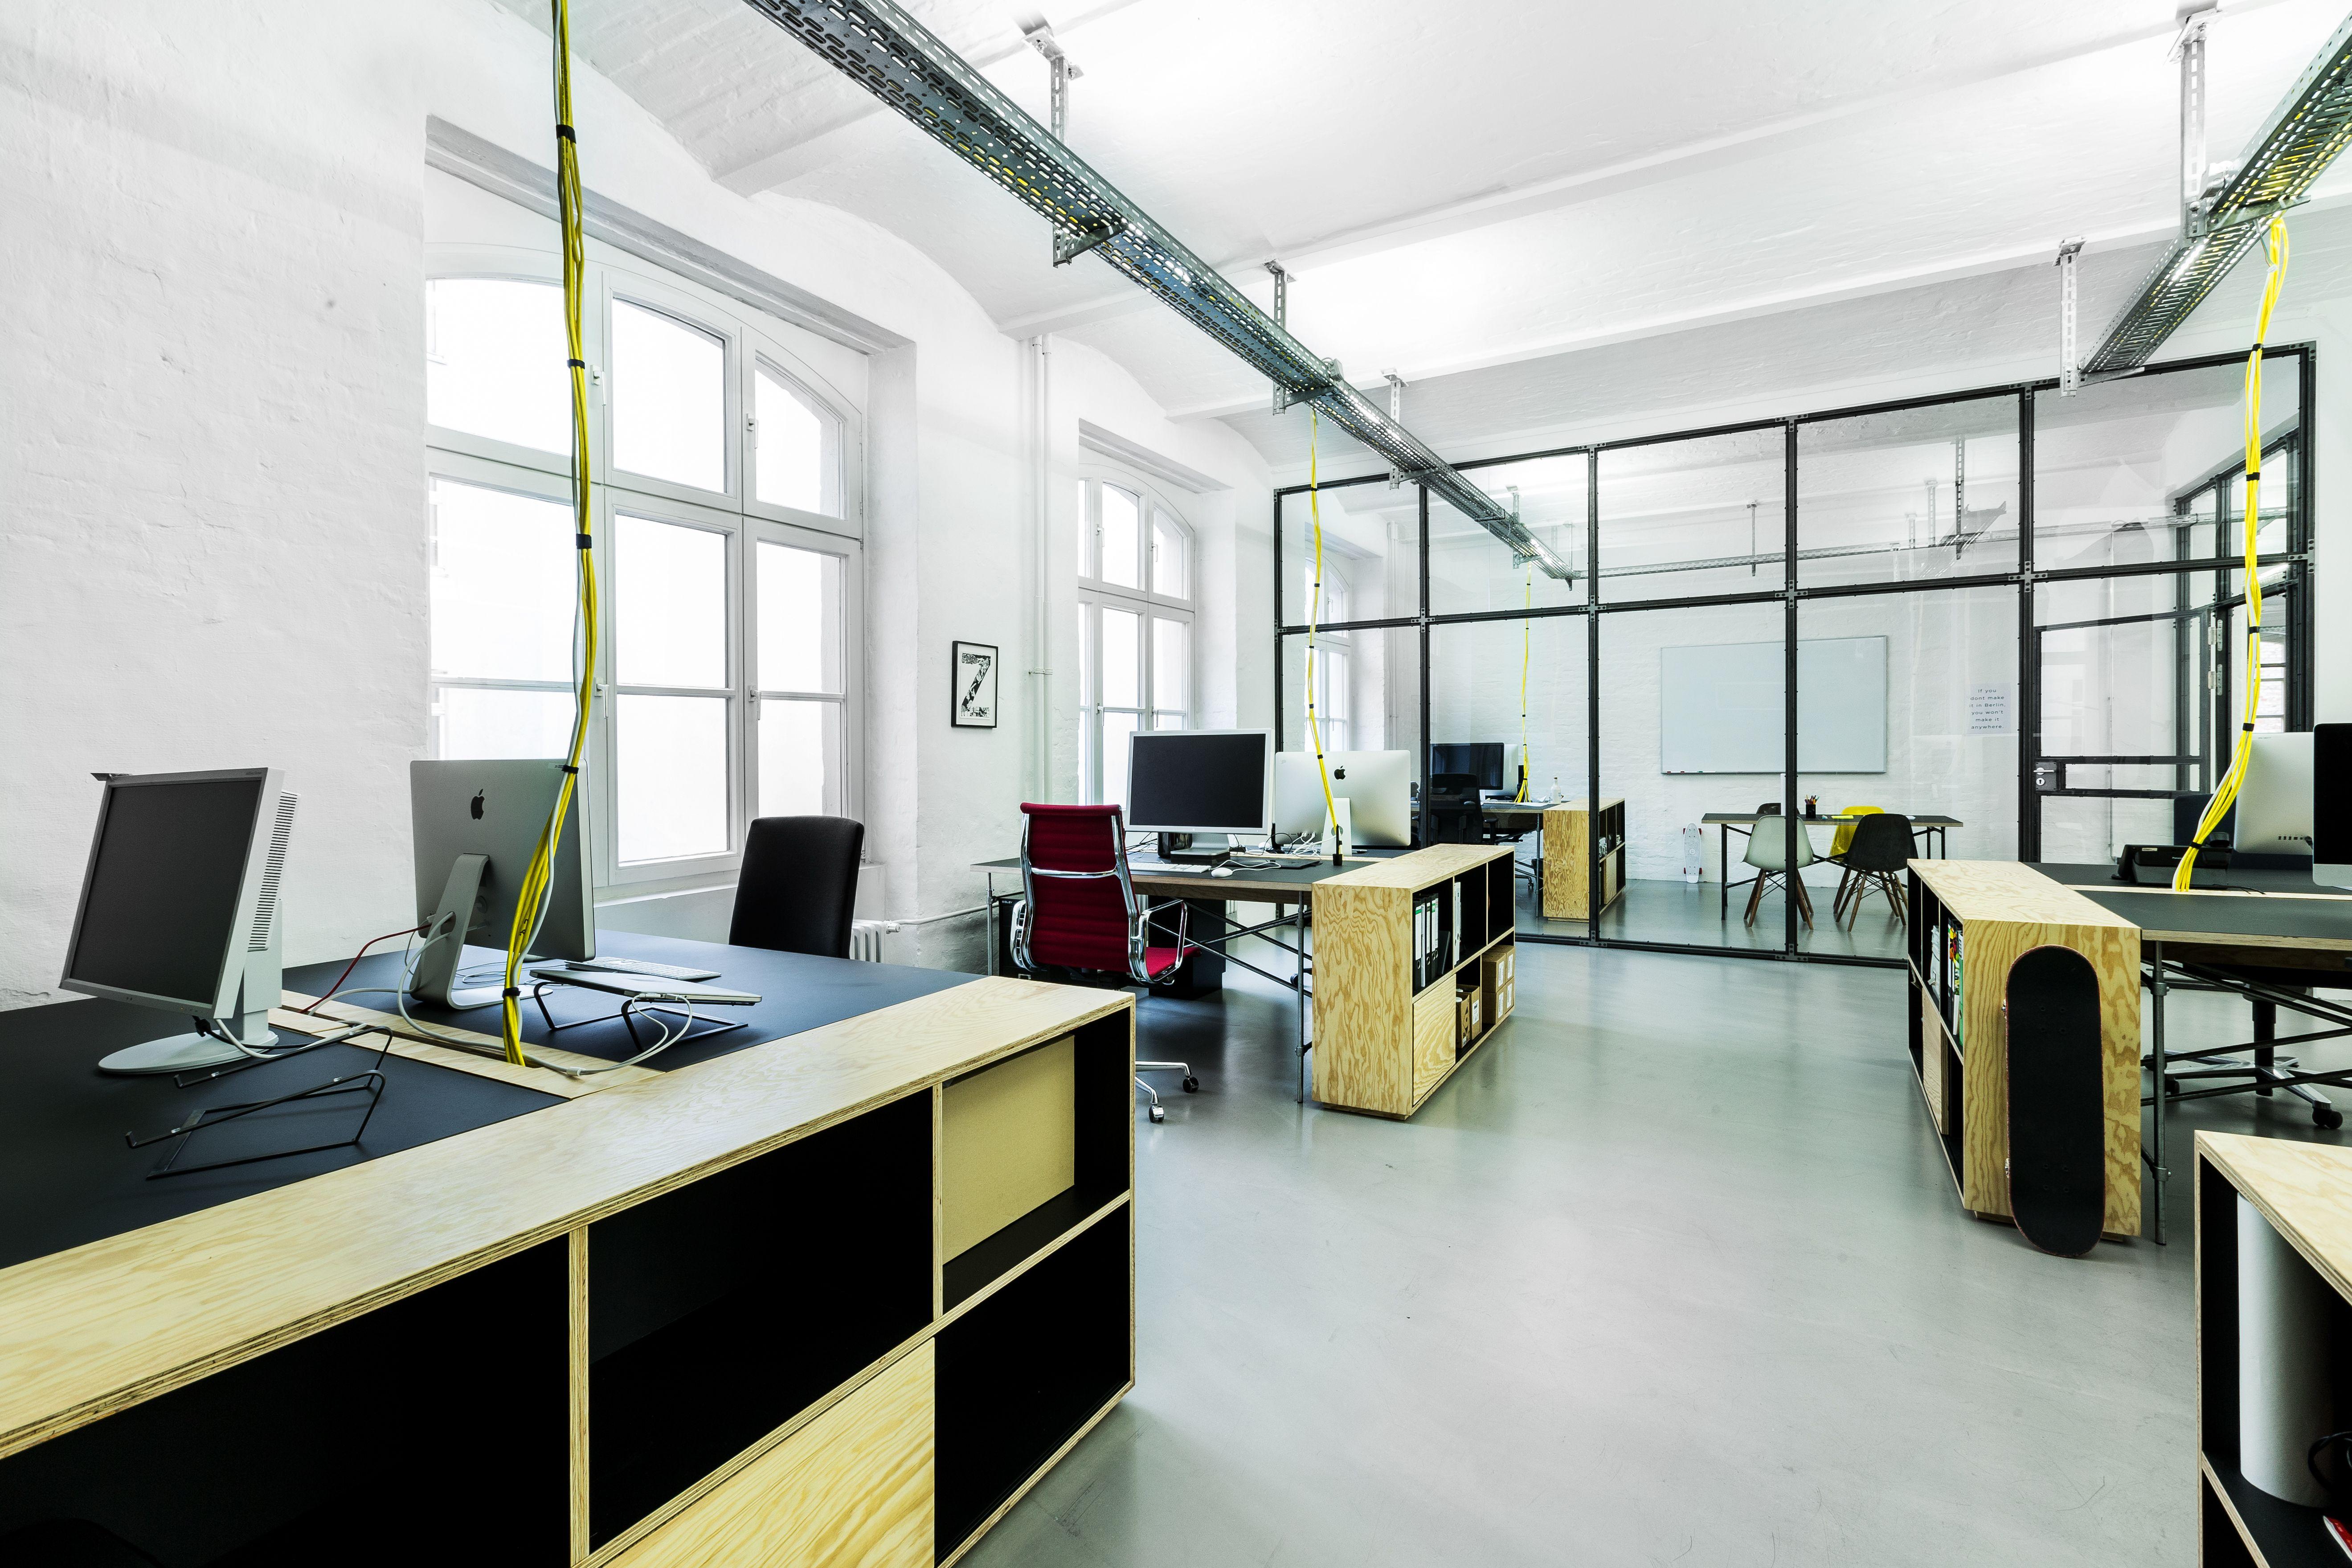 Office Interior By Zentralnorden #Office #Interior #Interiordesign # Industrial #Agency